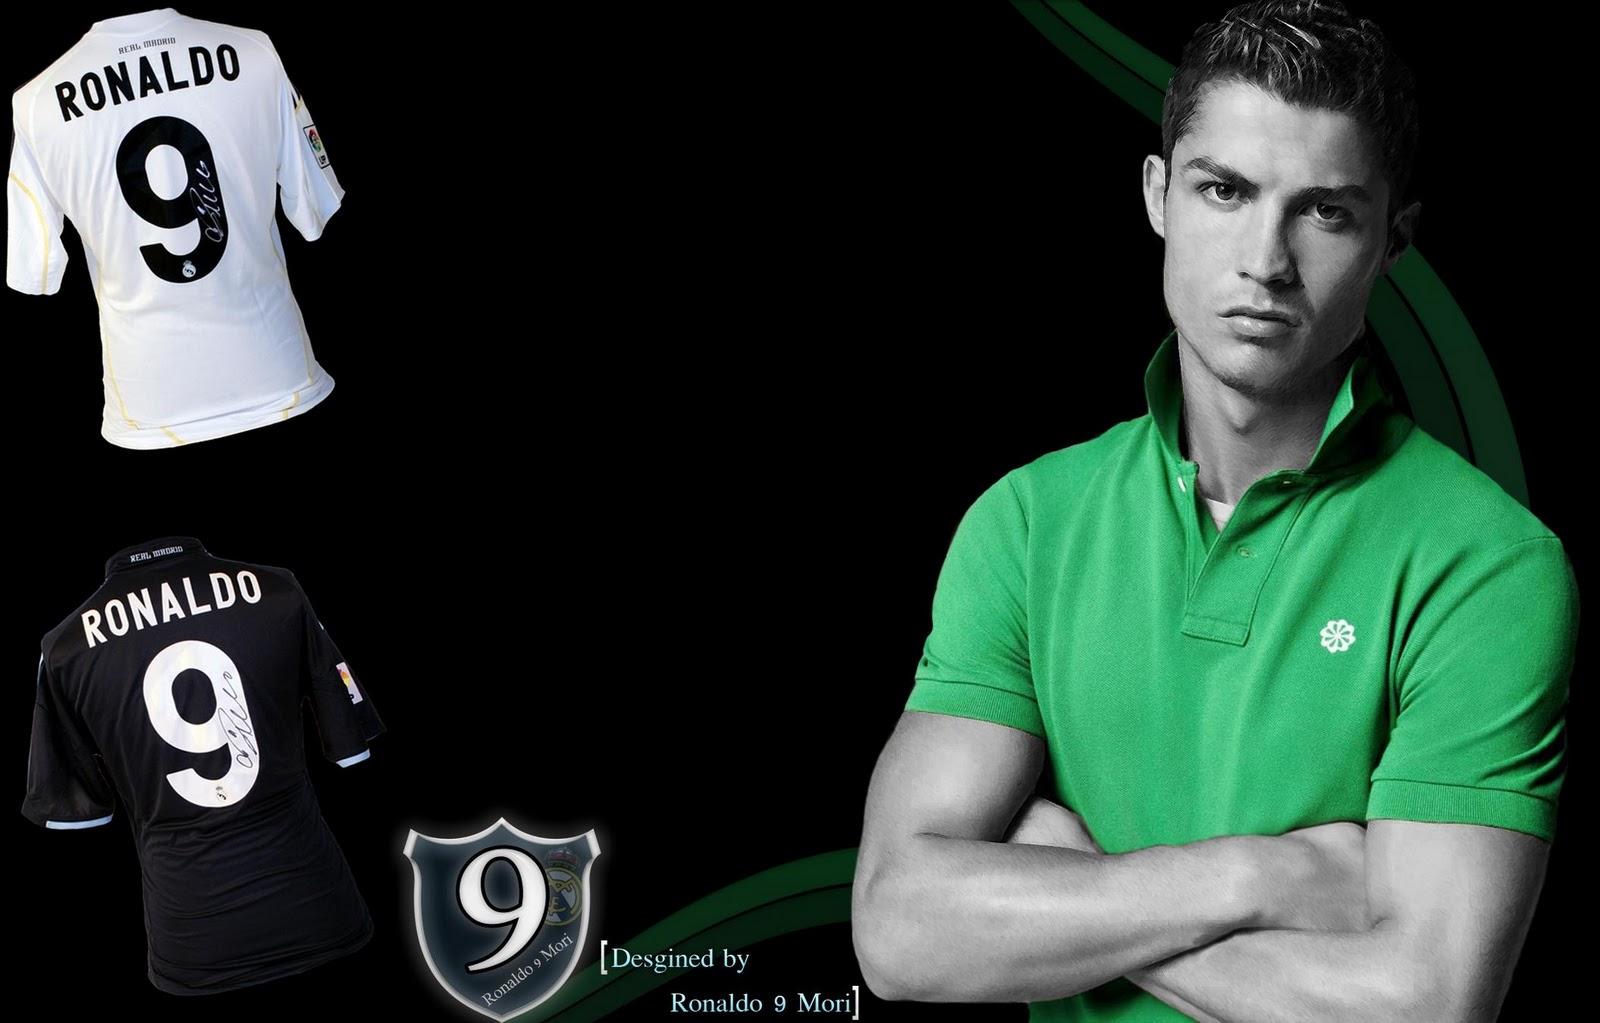 http://1.bp.blogspot.com/-L_Kh_2Y4ZNw/UBPcVIwYBGI/AAAAAAAAKvE/4s9fjFHHKHk/s1600/Cristiano_Ronaldo_06.jpg